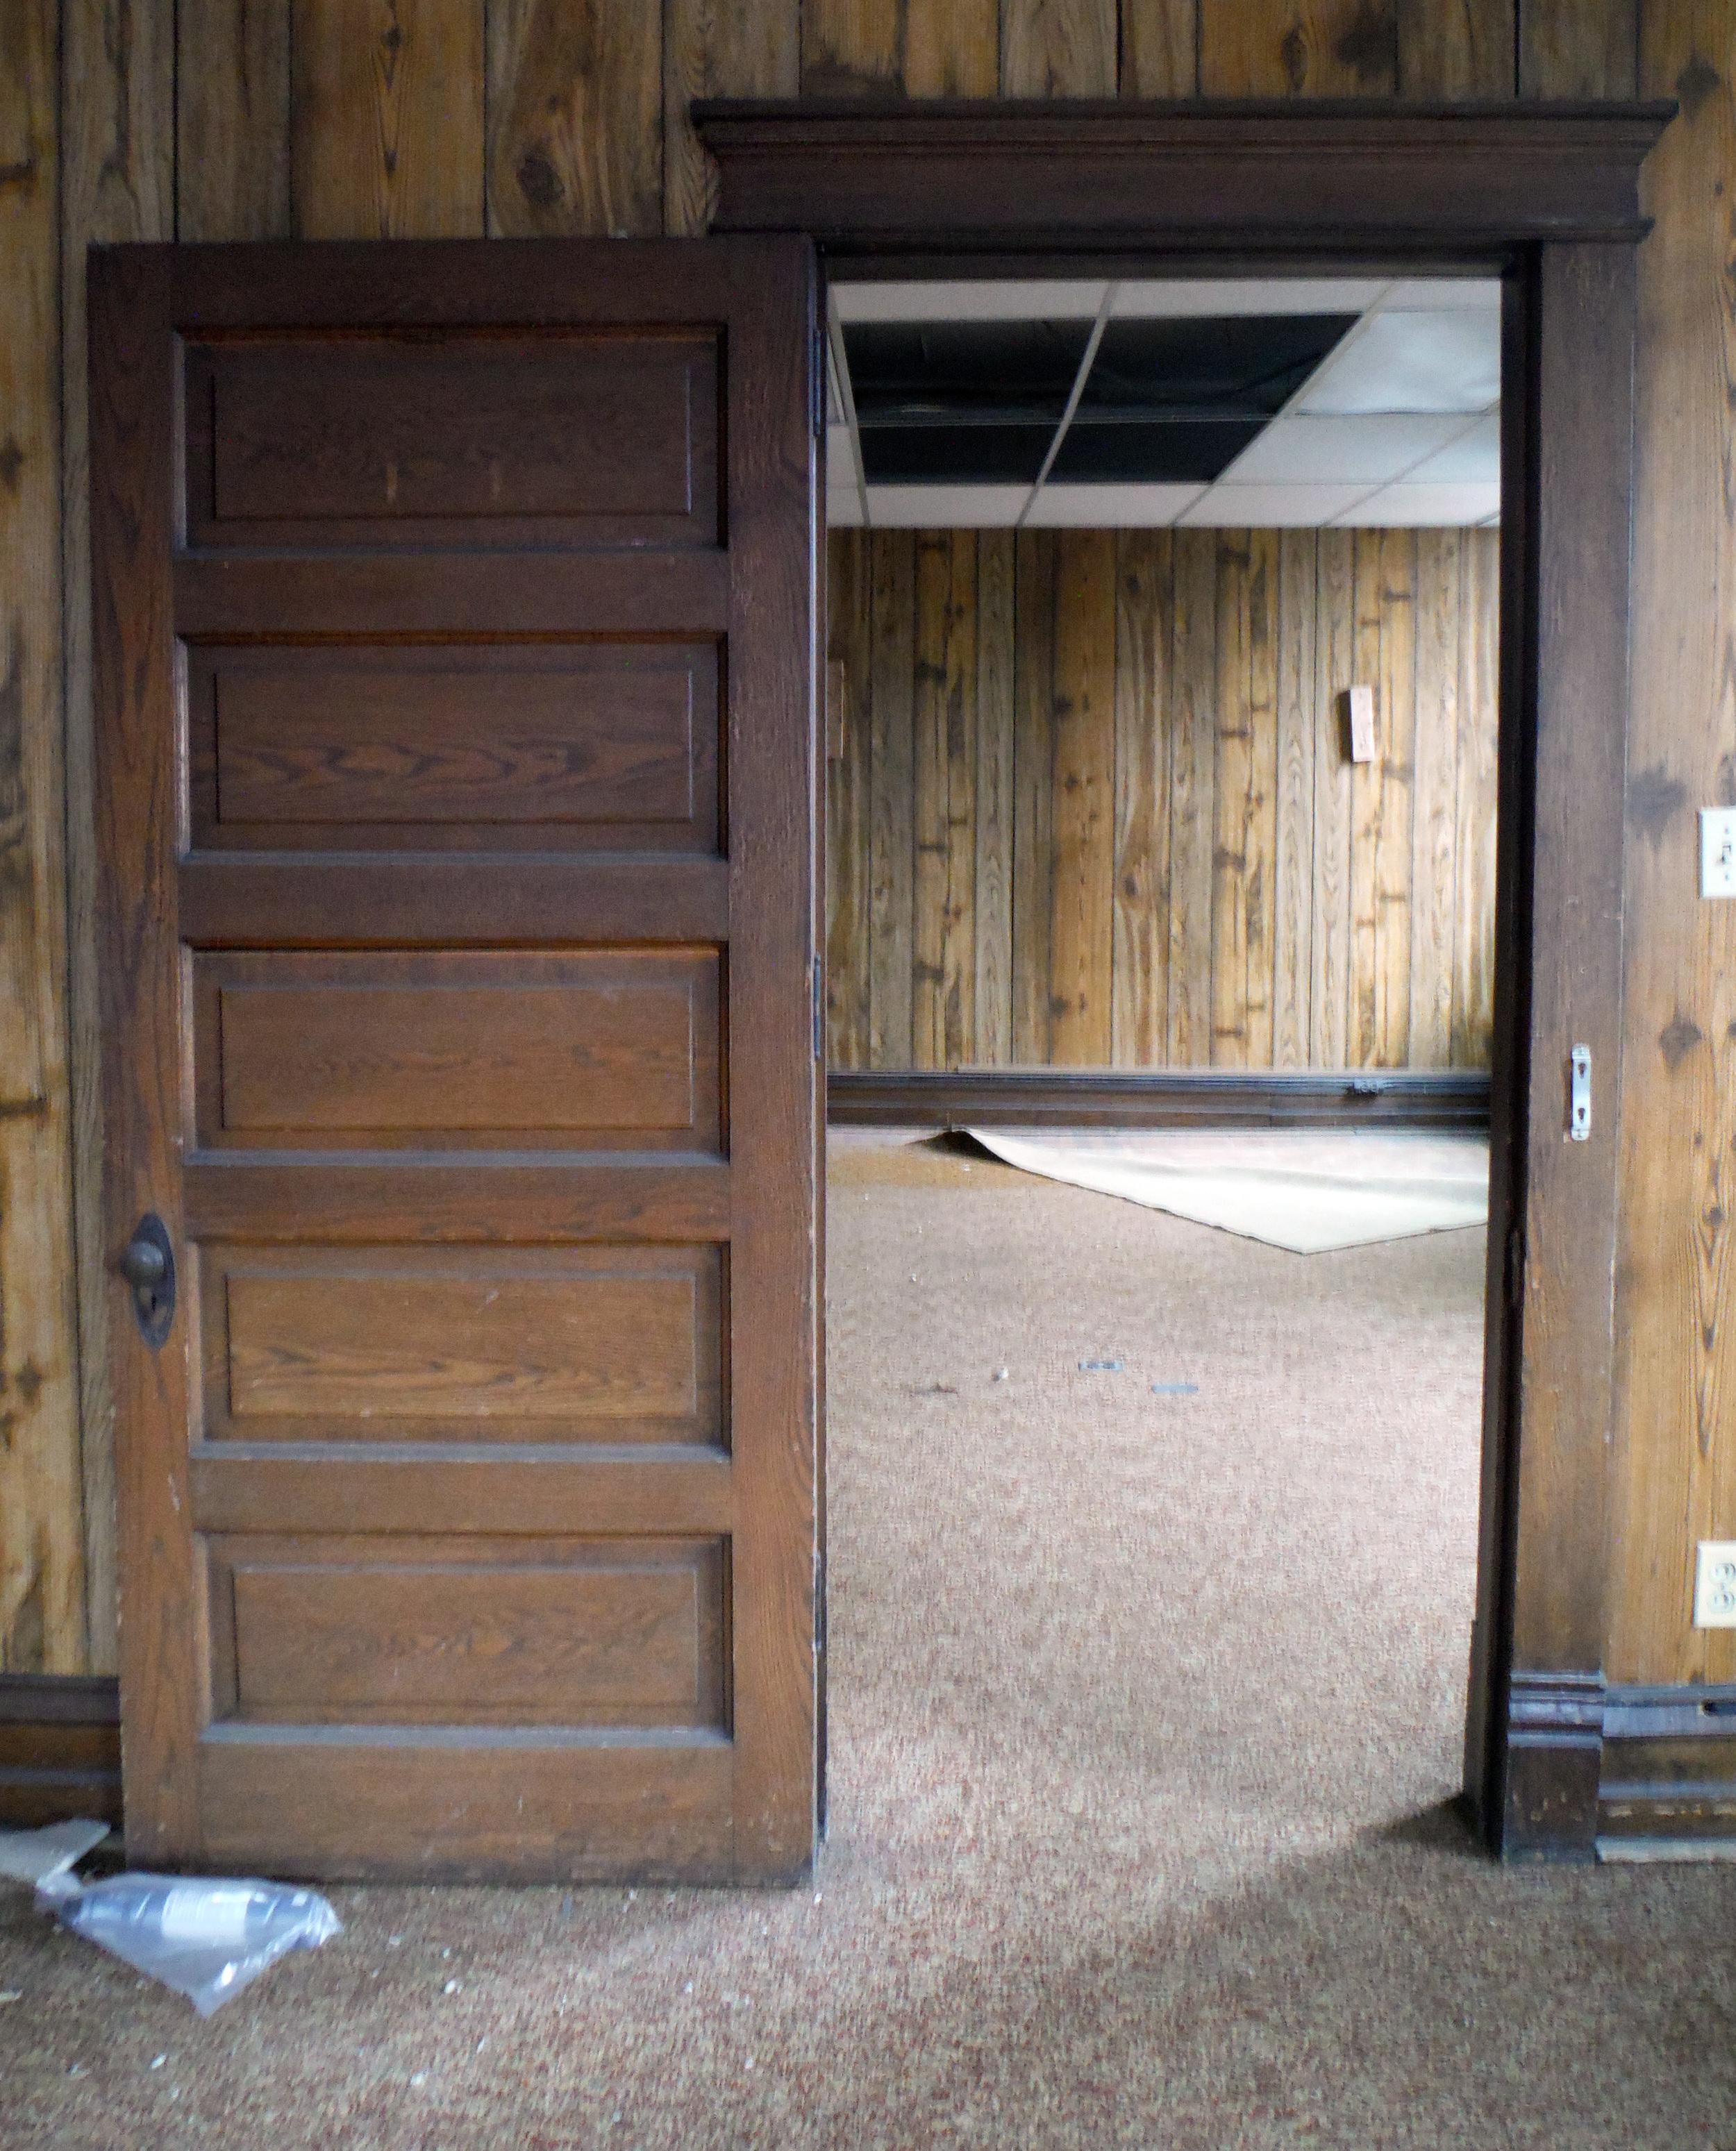 Second floor doorway. Photo by Sydney Haltom, March 2015.